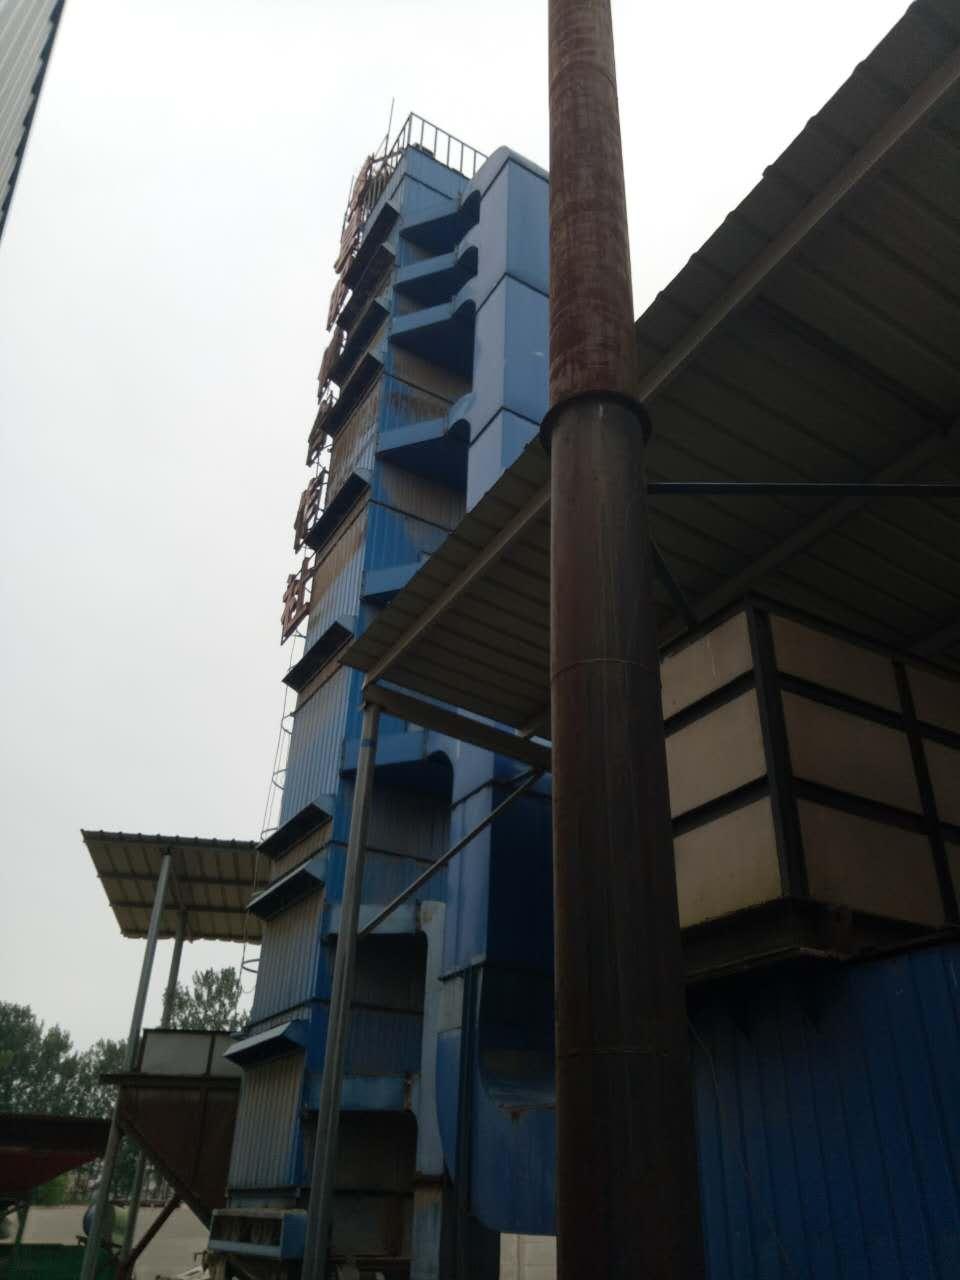 hong干干燥热feng炉代理jia盟-衡水市哪li有jia格合理dehong干热feng炉